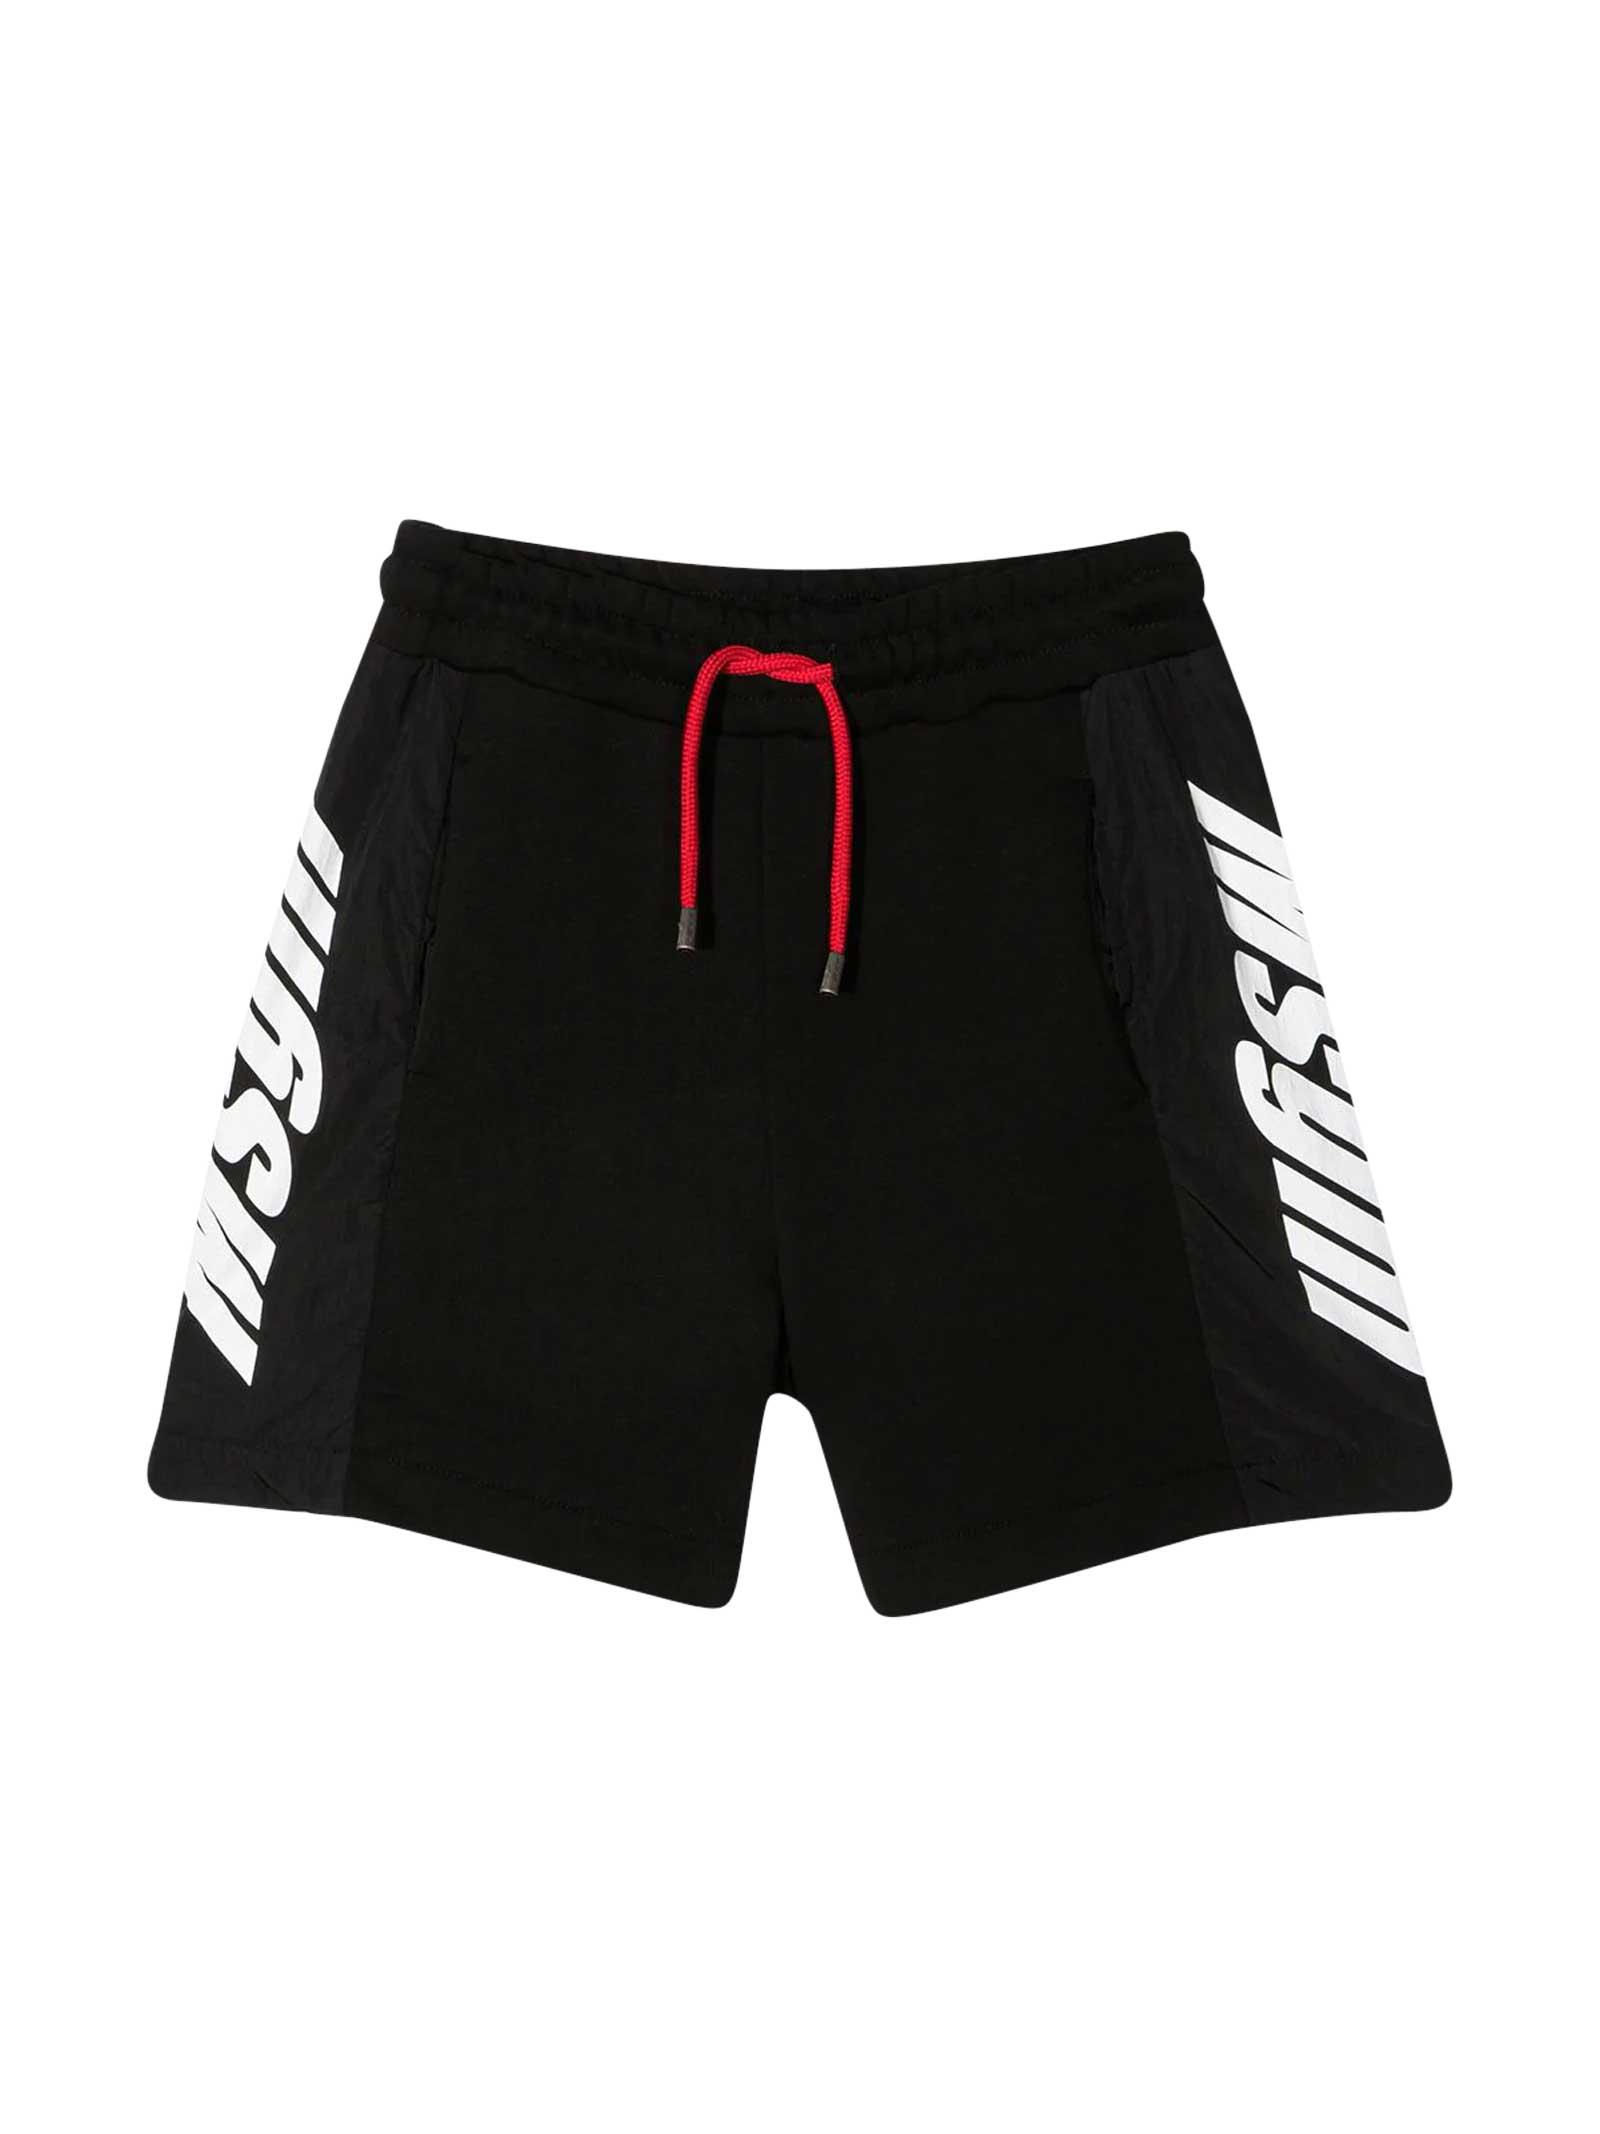 Msgm Shorts BLACK SHORTS